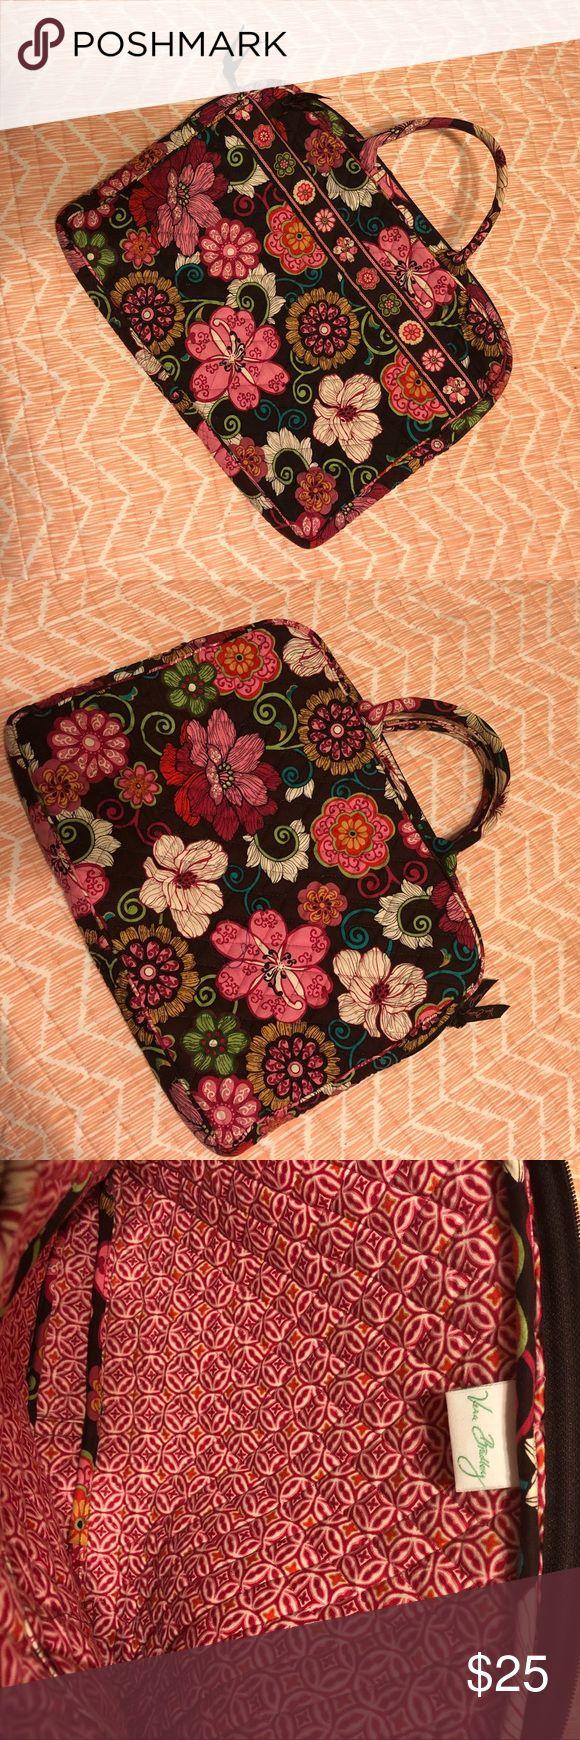 Vera Bradley laptop case Like new condition. Vera Bradley Bags Laptop Bags